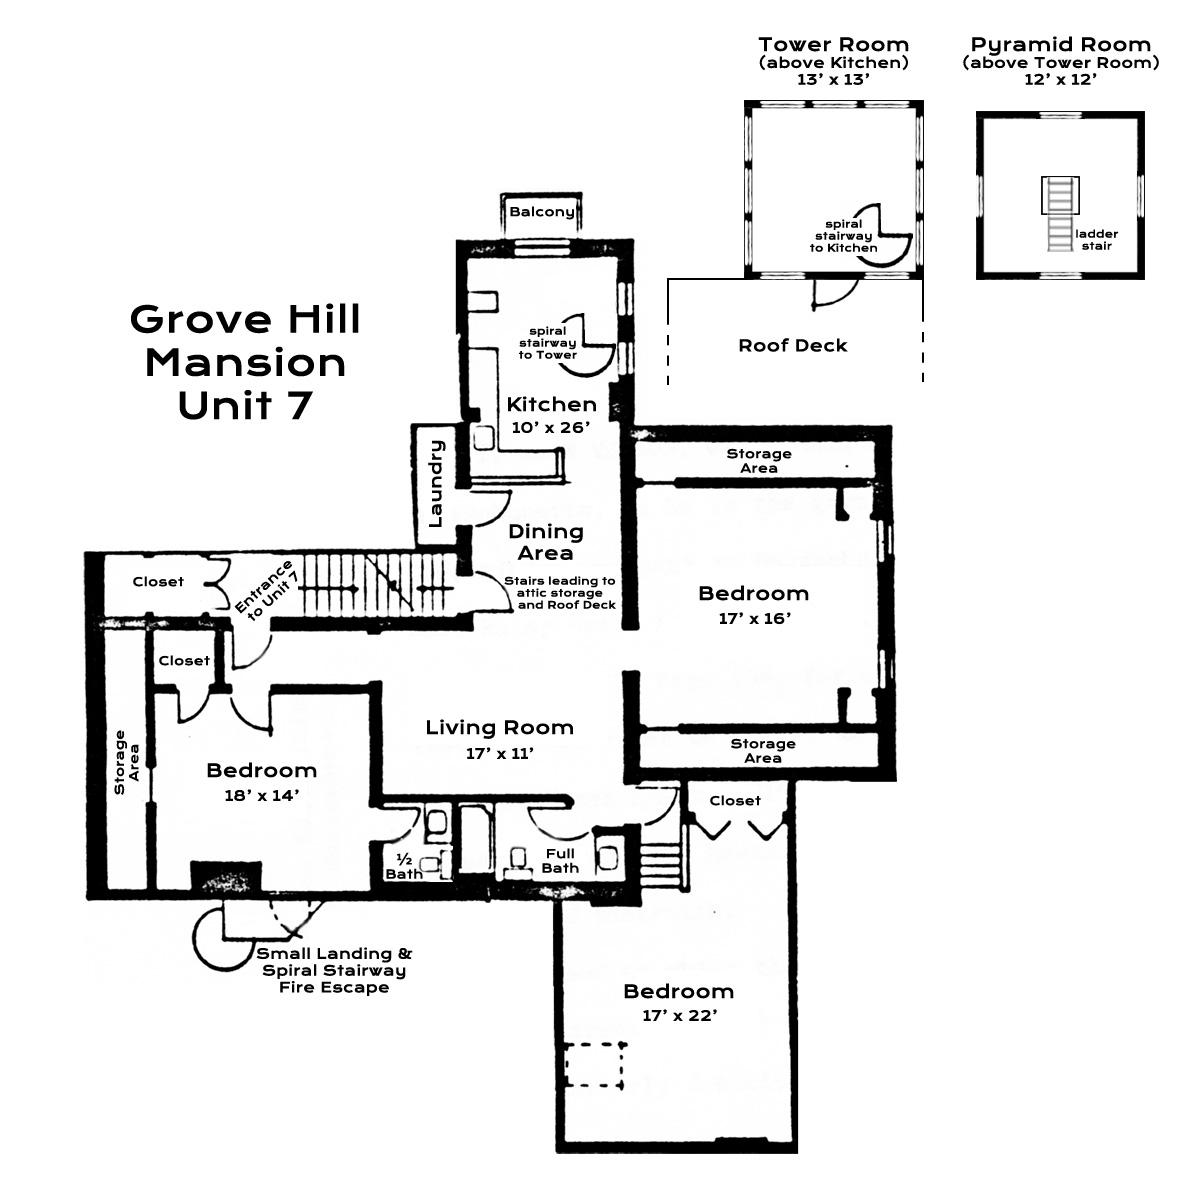 Mansion Grove Apartments: Grove Hill Mansion Condominium For Sale